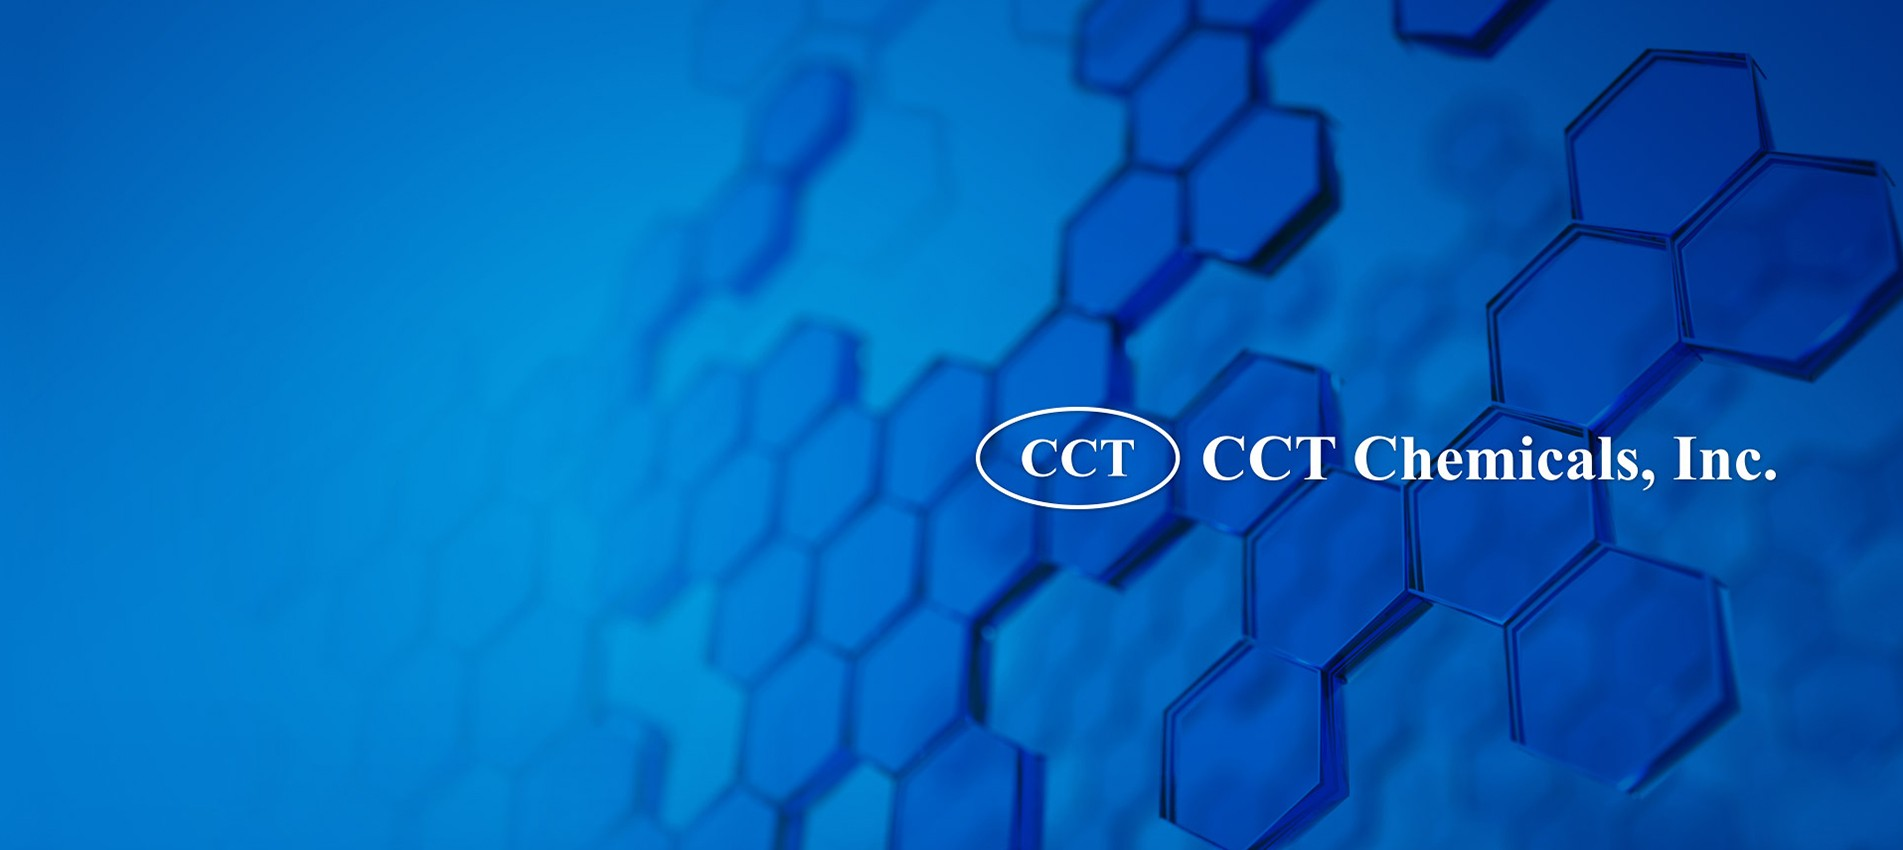 CCT Chemicals, Inc  | LinkedIn